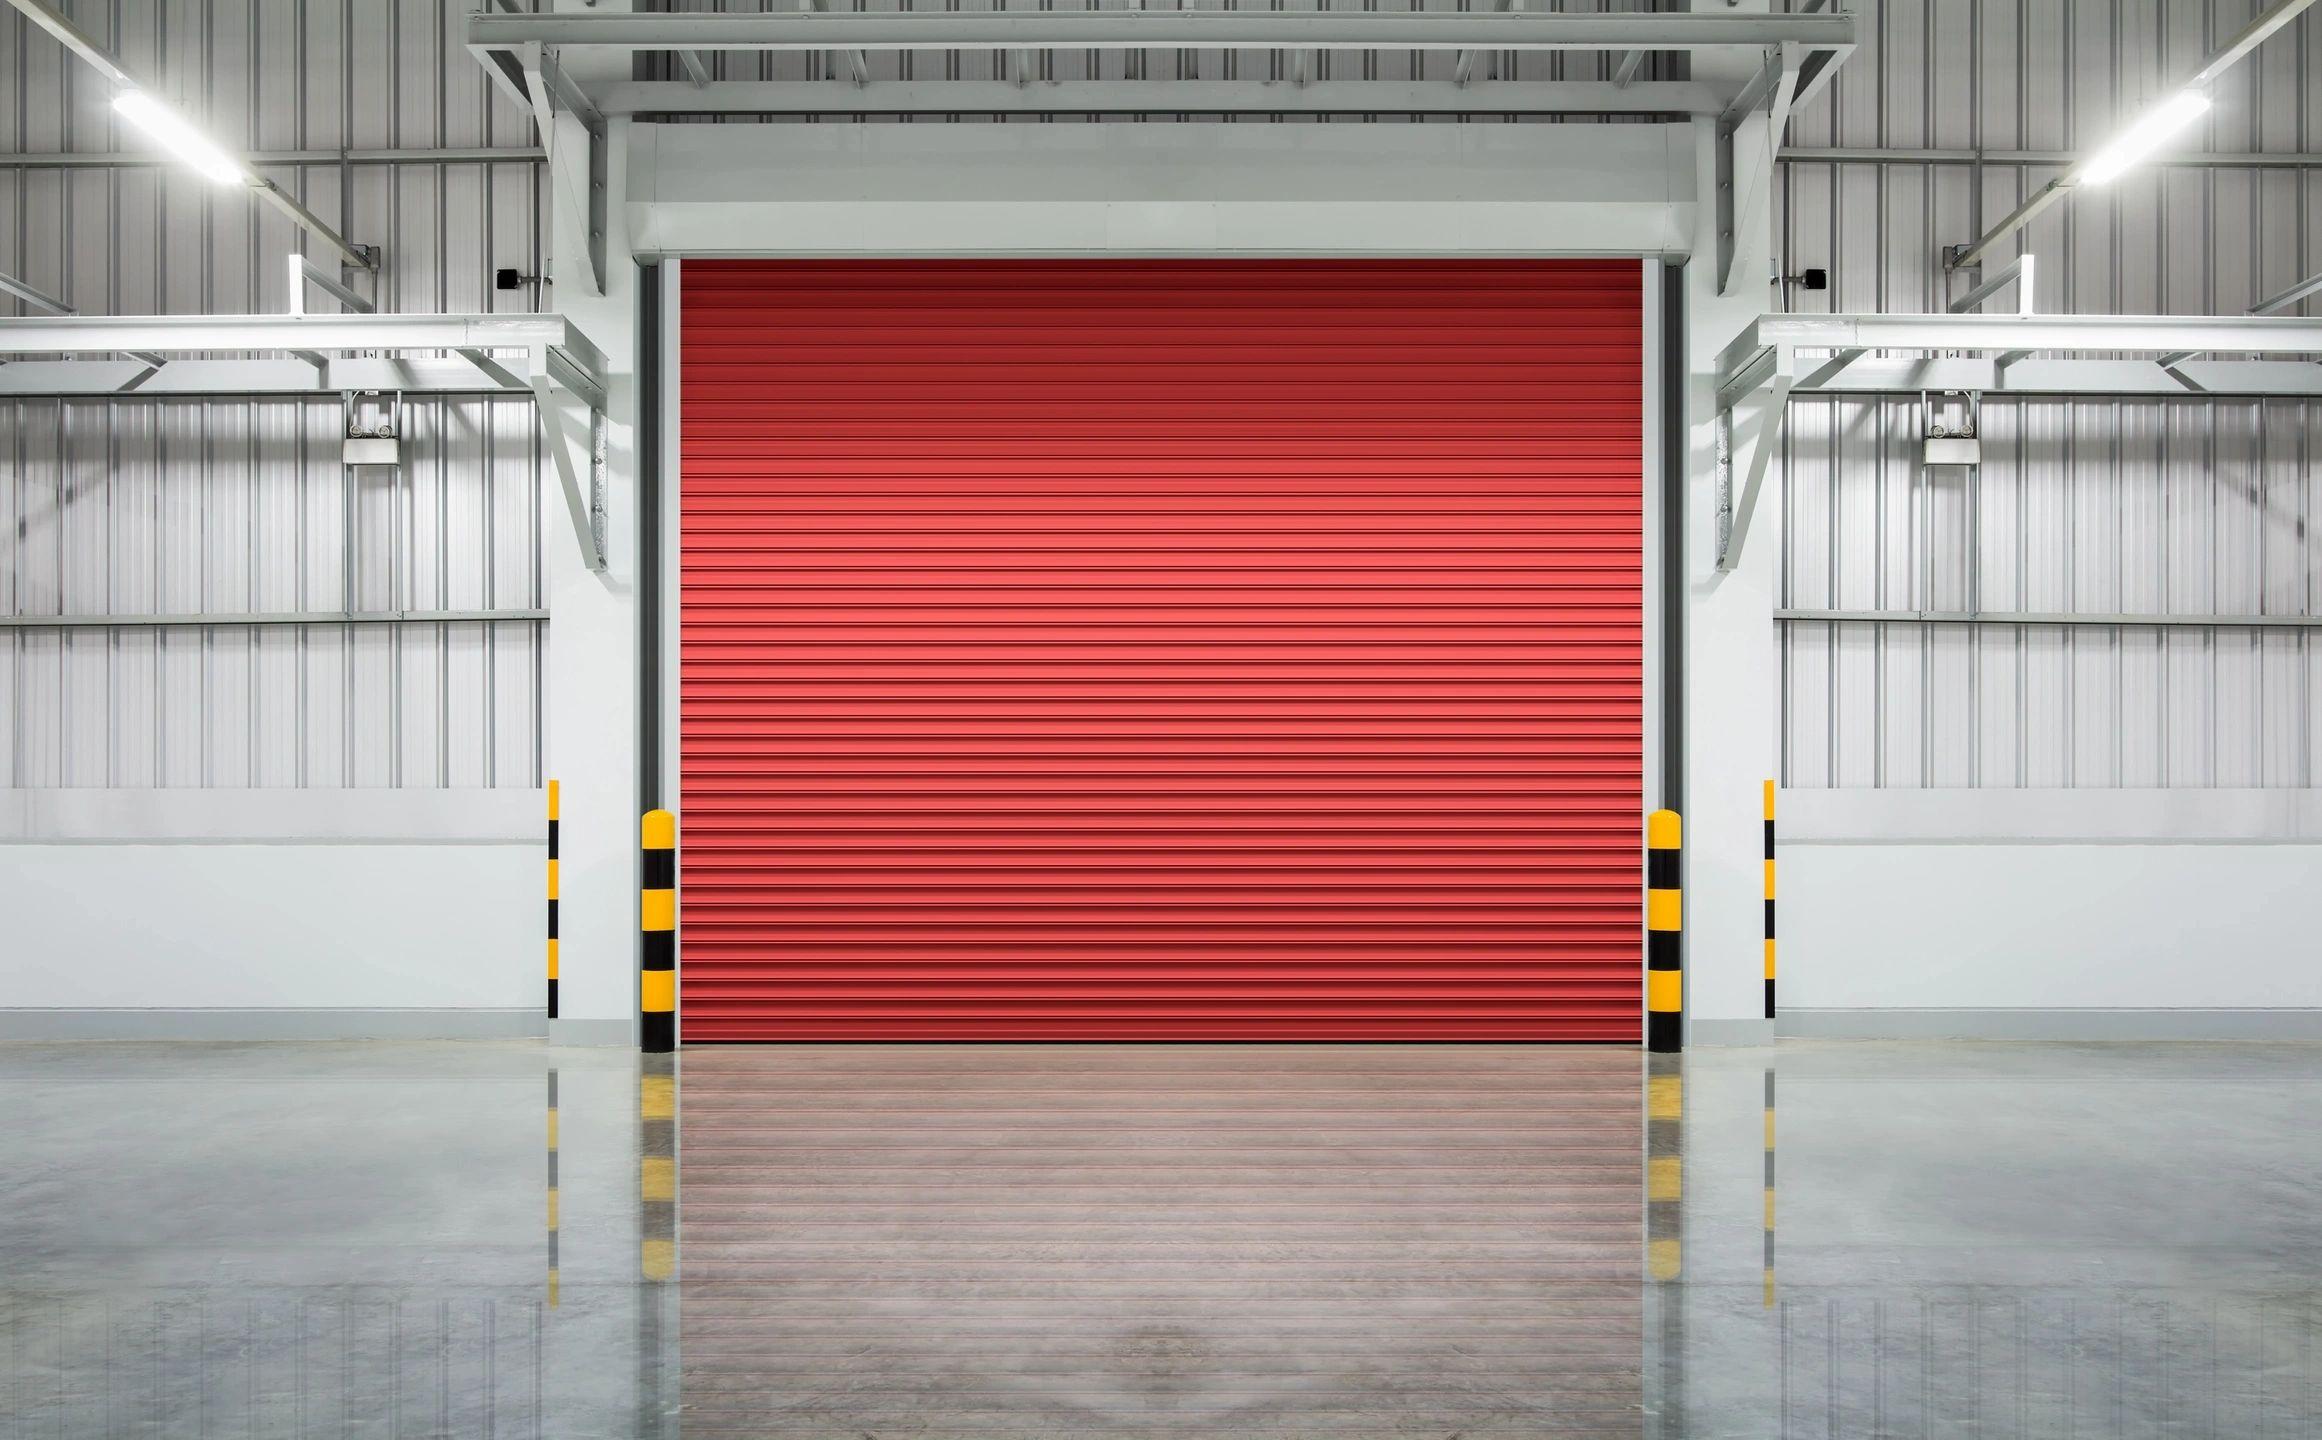 fix and garage youtube problems repair common troubleshooting door opener to how watch